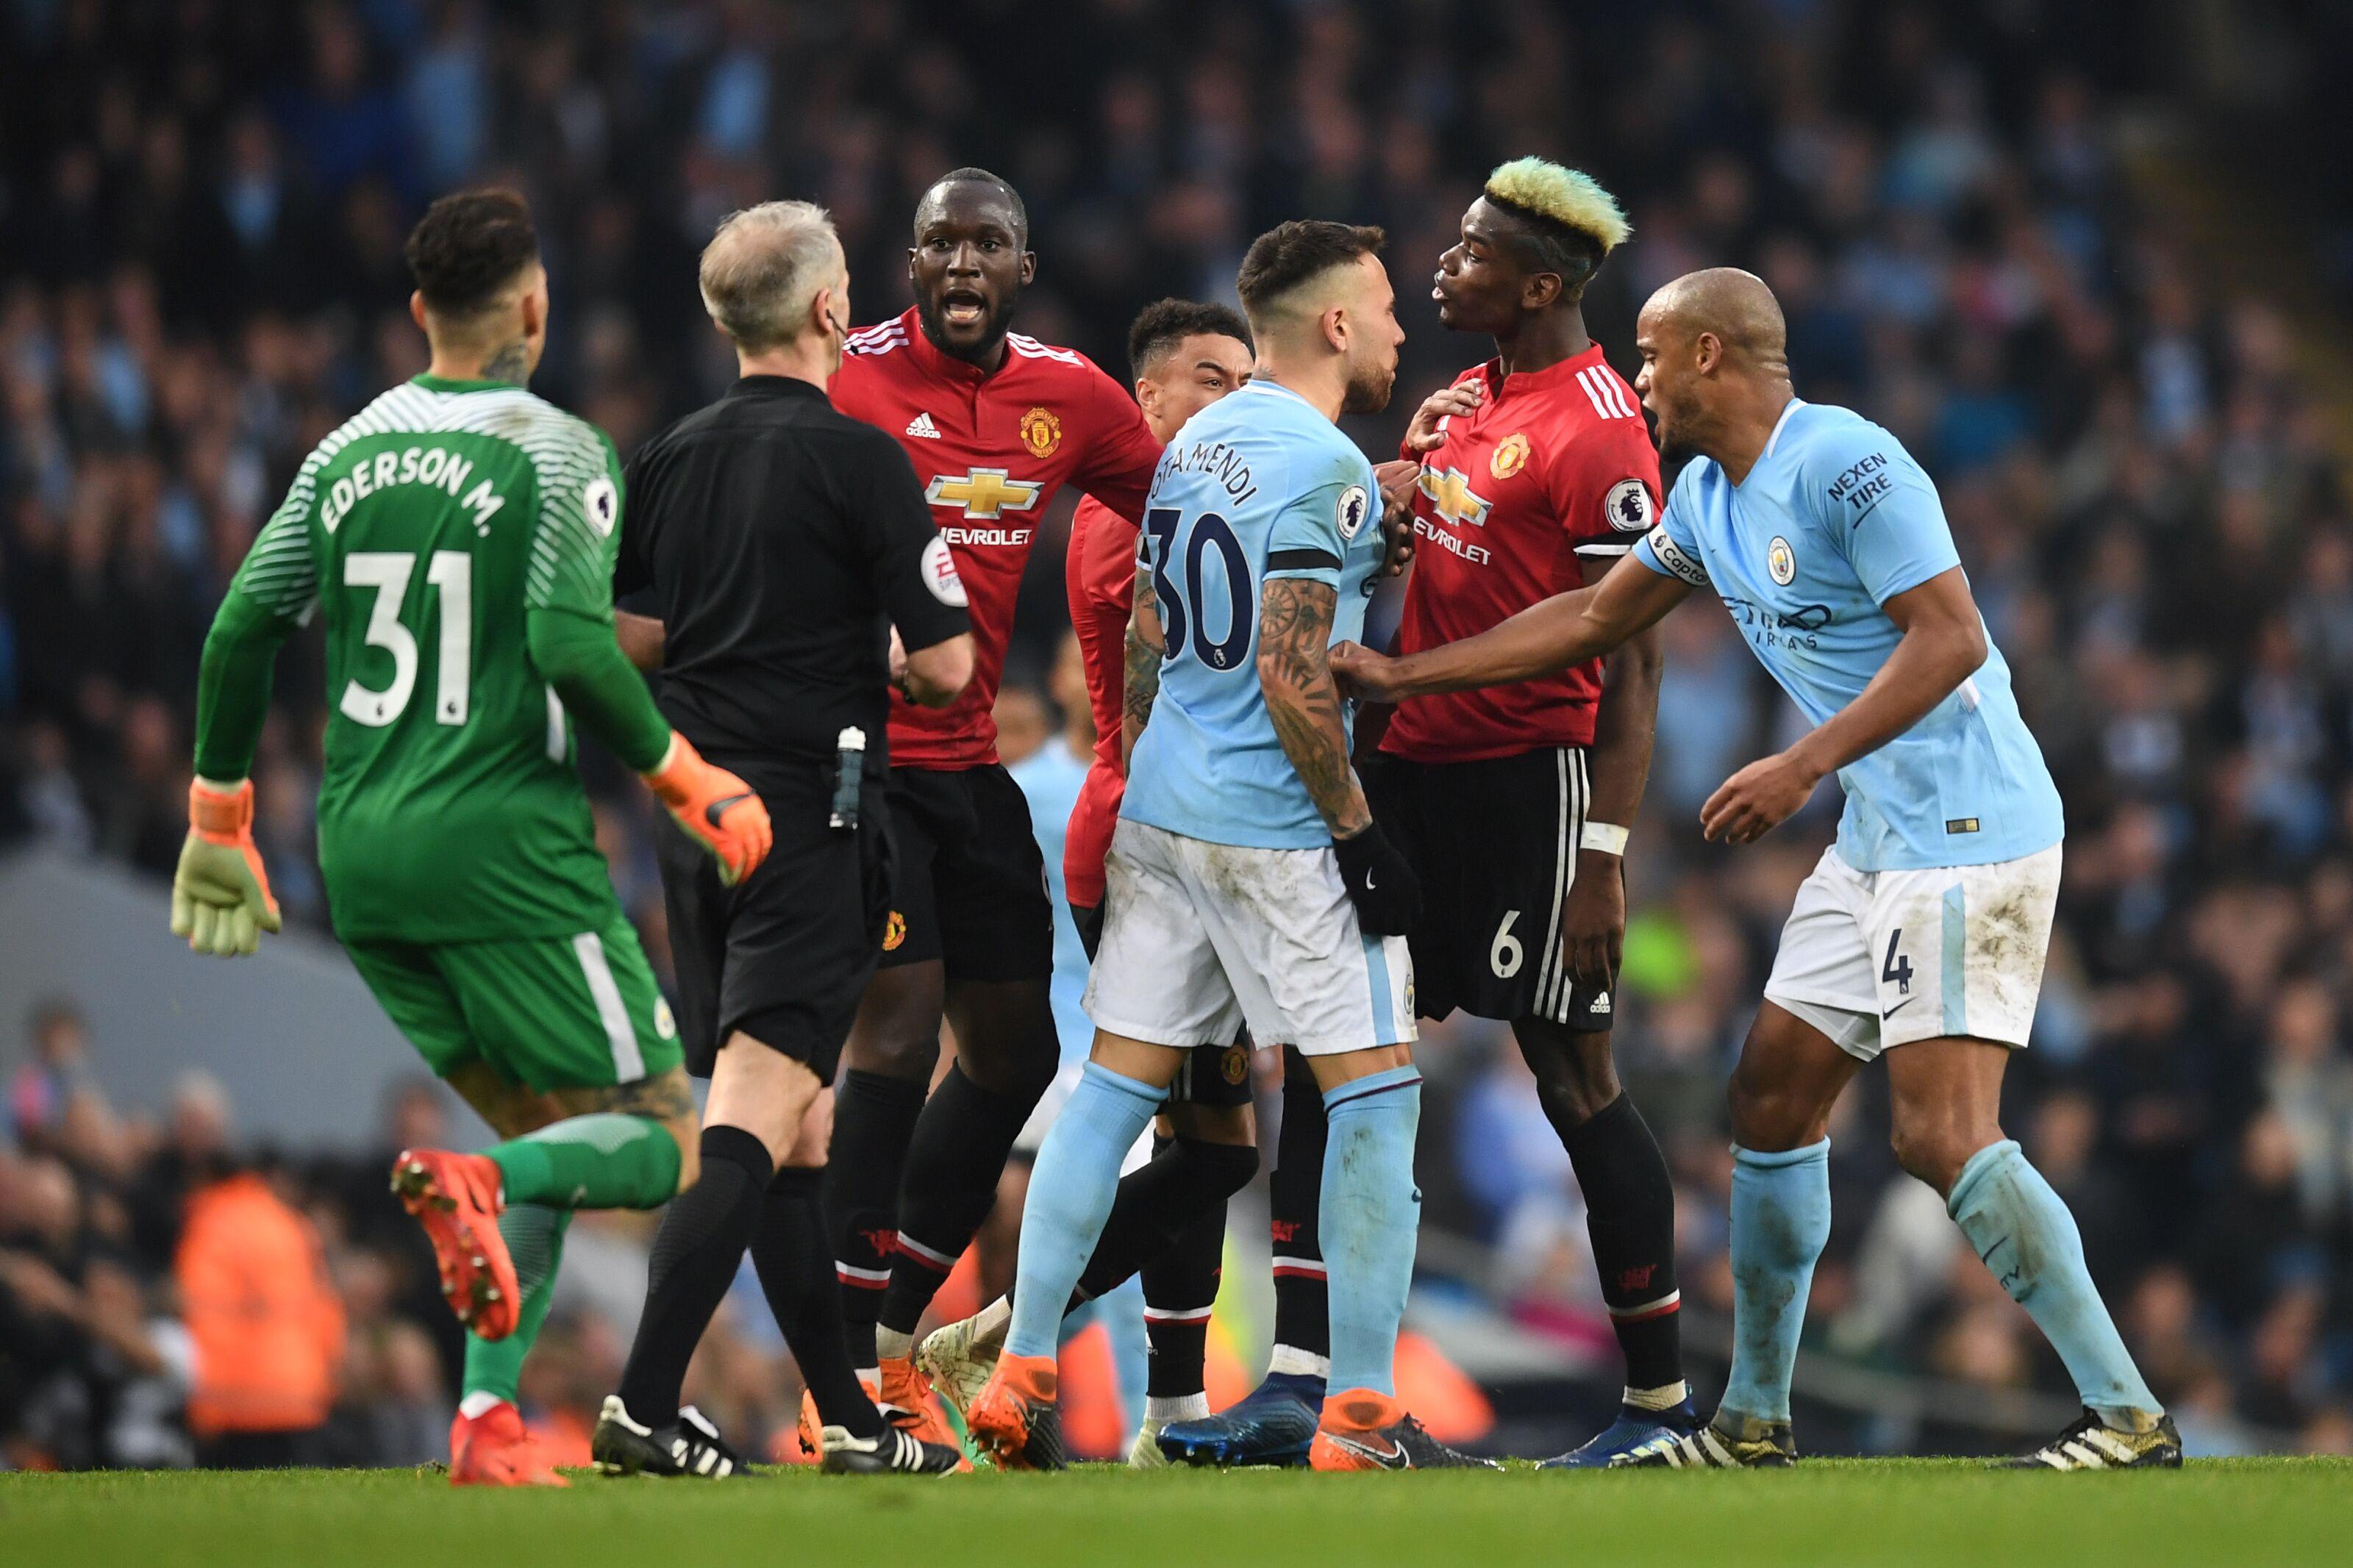 Manchester United Vs Manchester City: Manchester City 2-3 Manchester United: Highlights And Recap